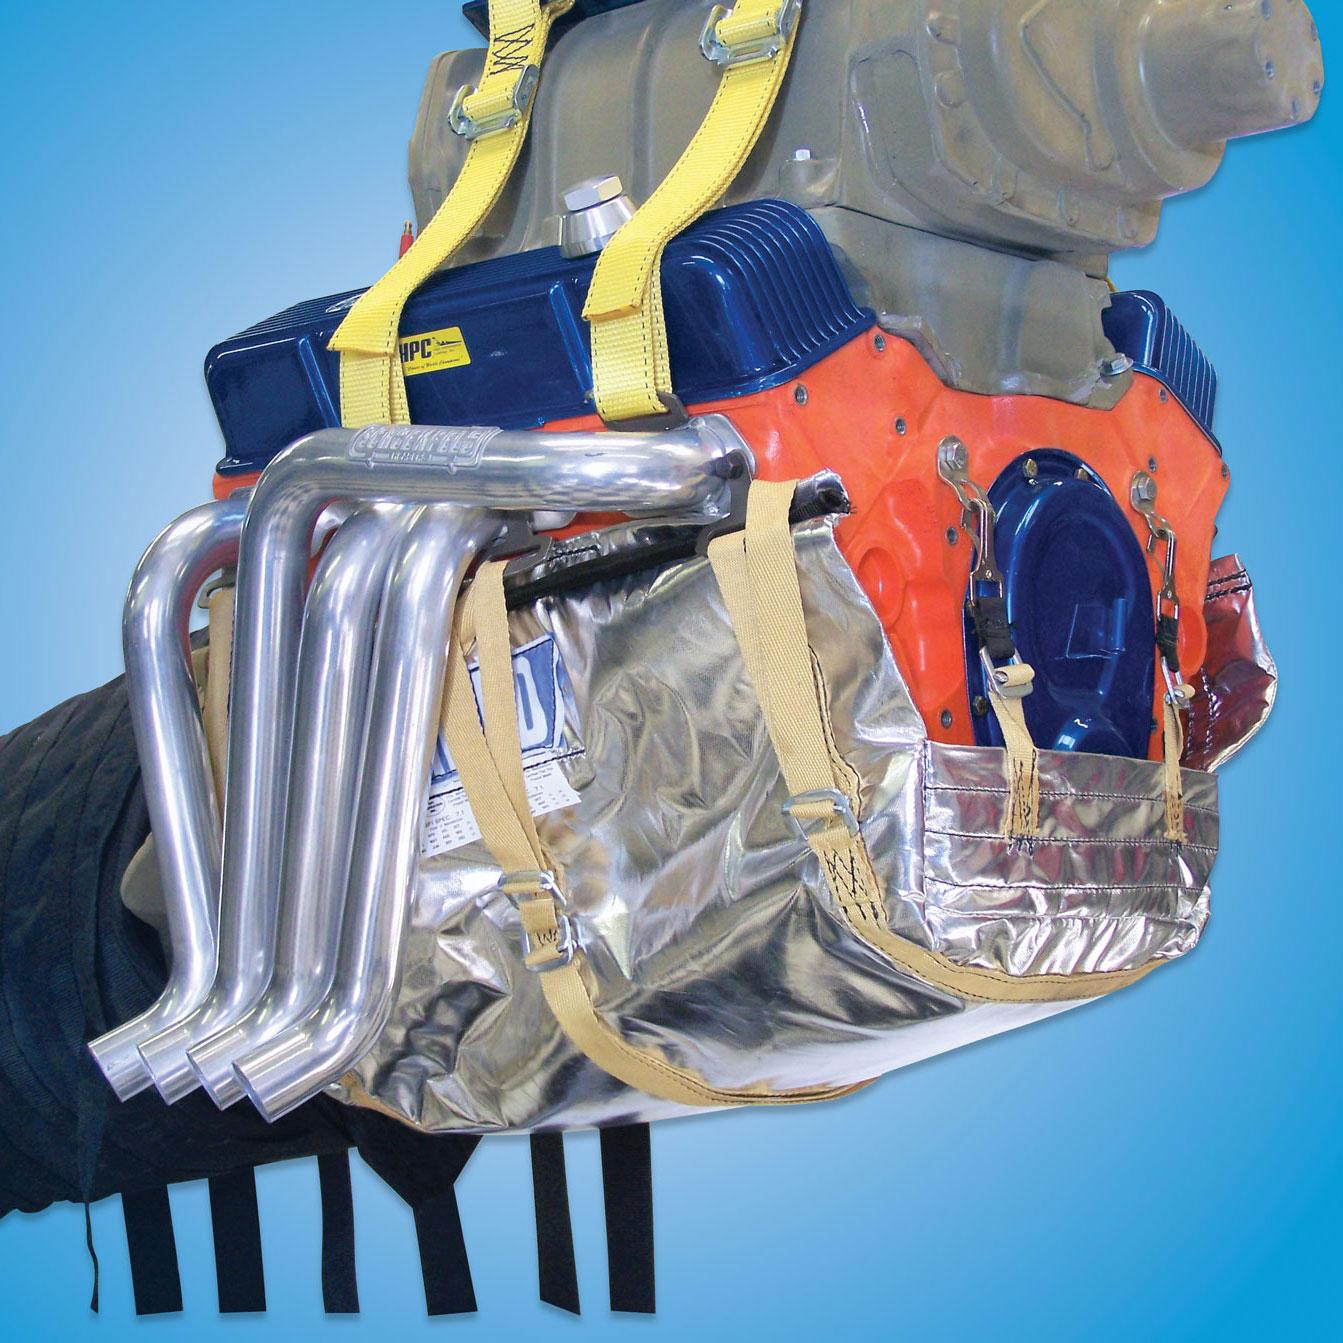 Engine Diaper, Complete   Engine diaper comes in the SFI 7.1, Kevlar style.   Engine Diaper - Complete 7.1  Part #1020 — $1,045